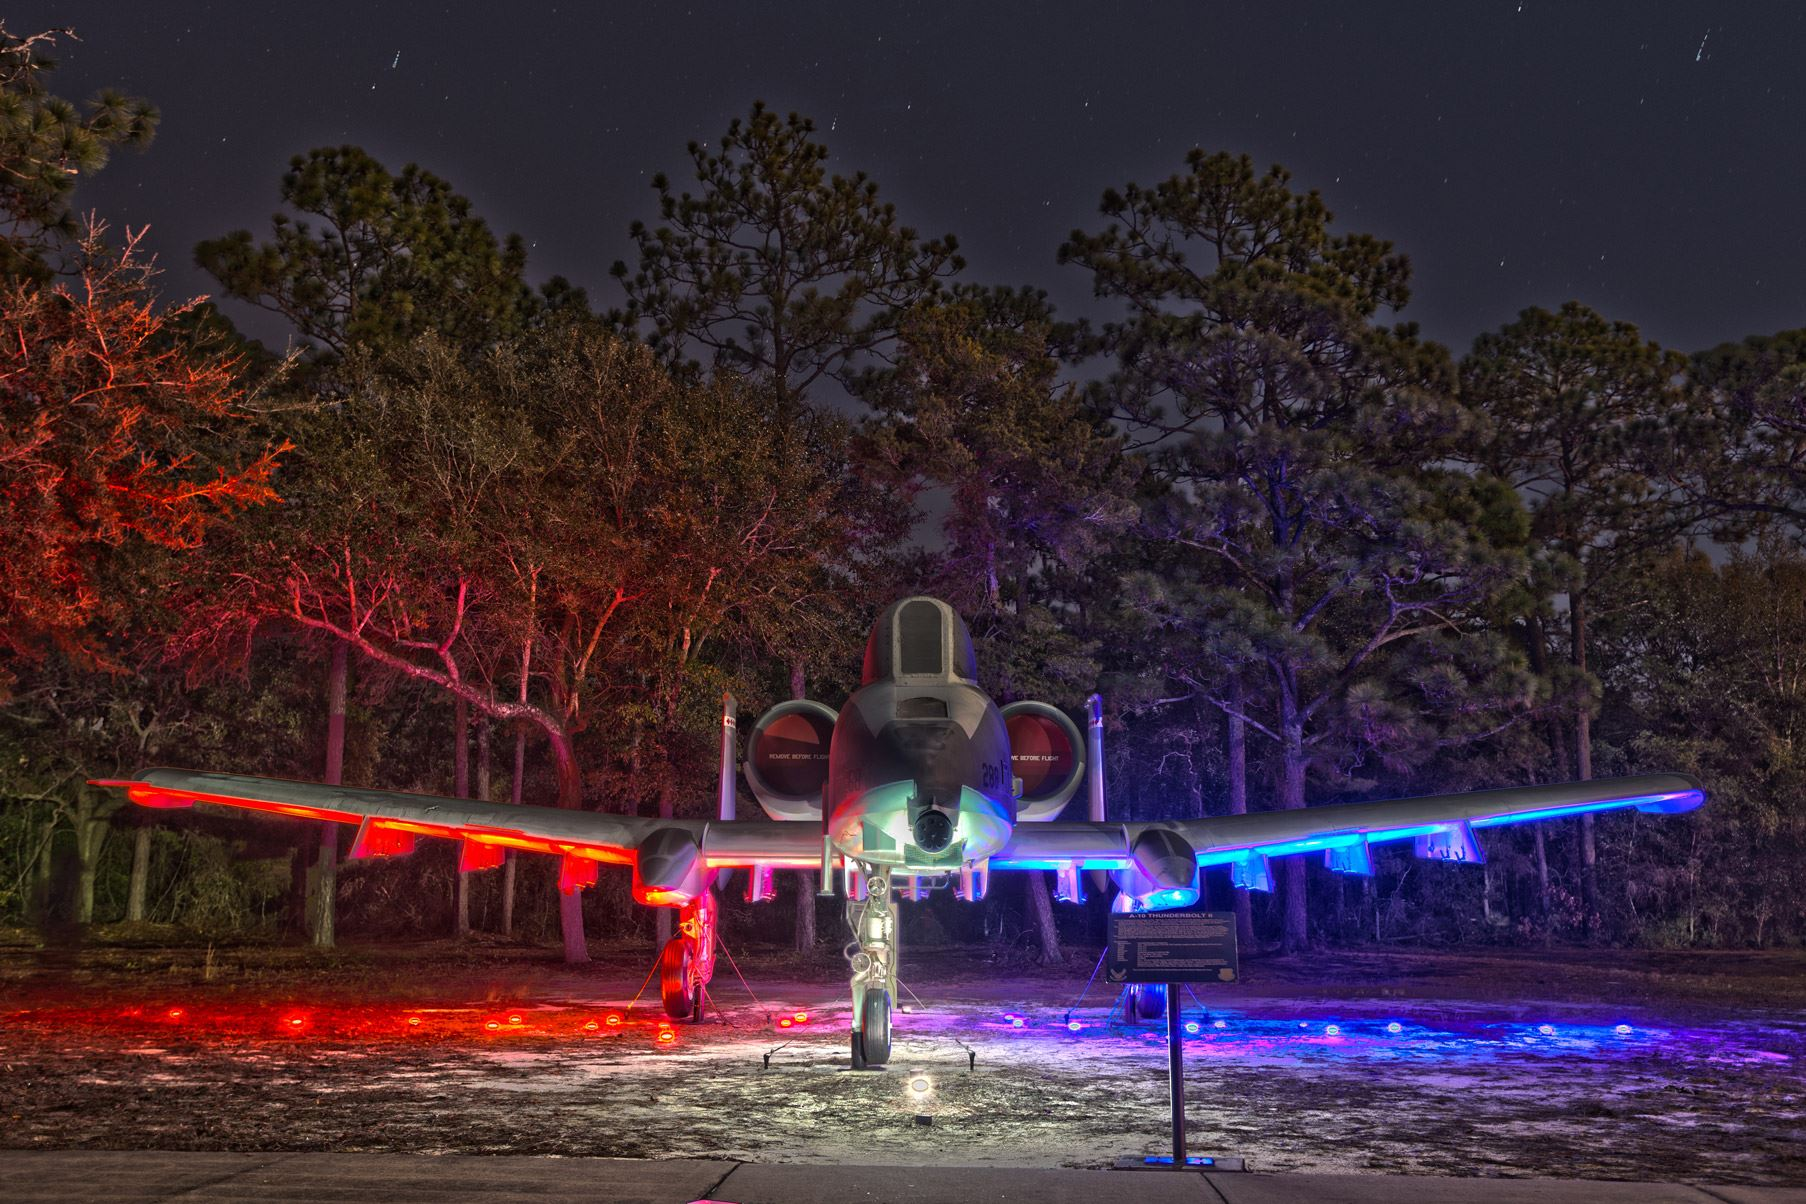 Knomad Colab's pop-up public light art installations